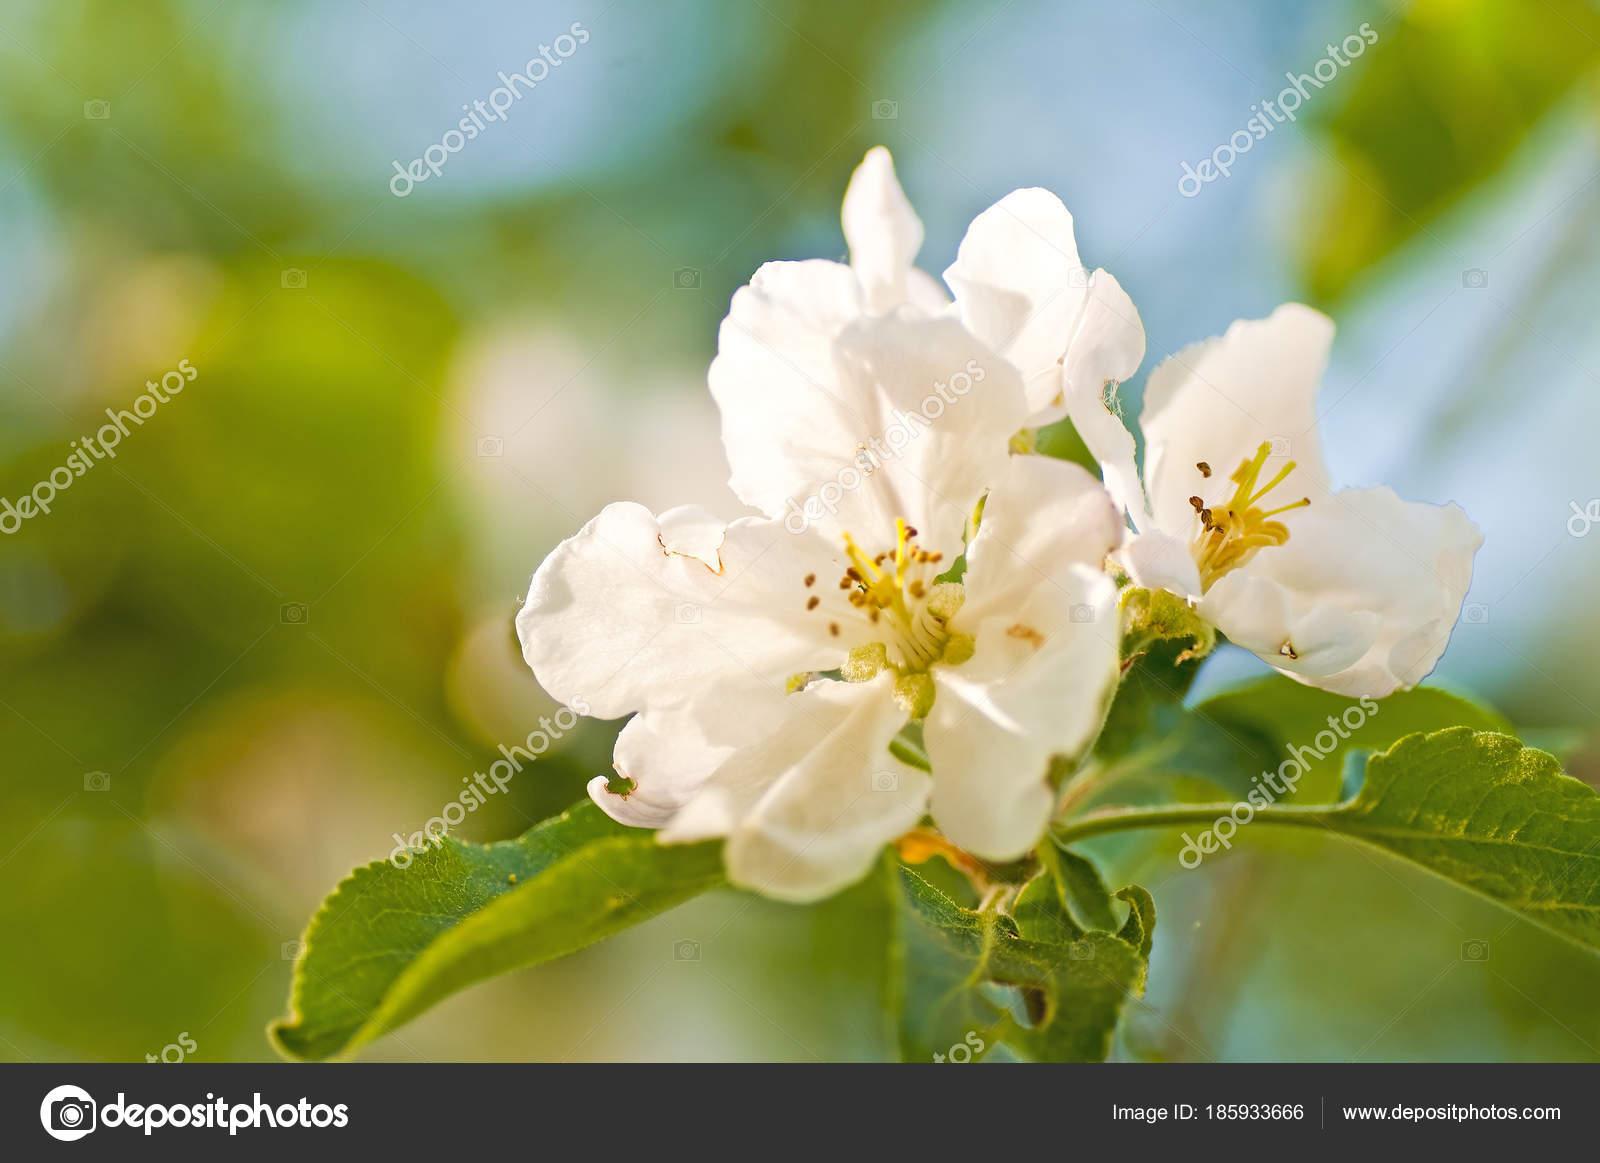 Close Beautiful Apple Blossom White Flowers Trees Stock Photo